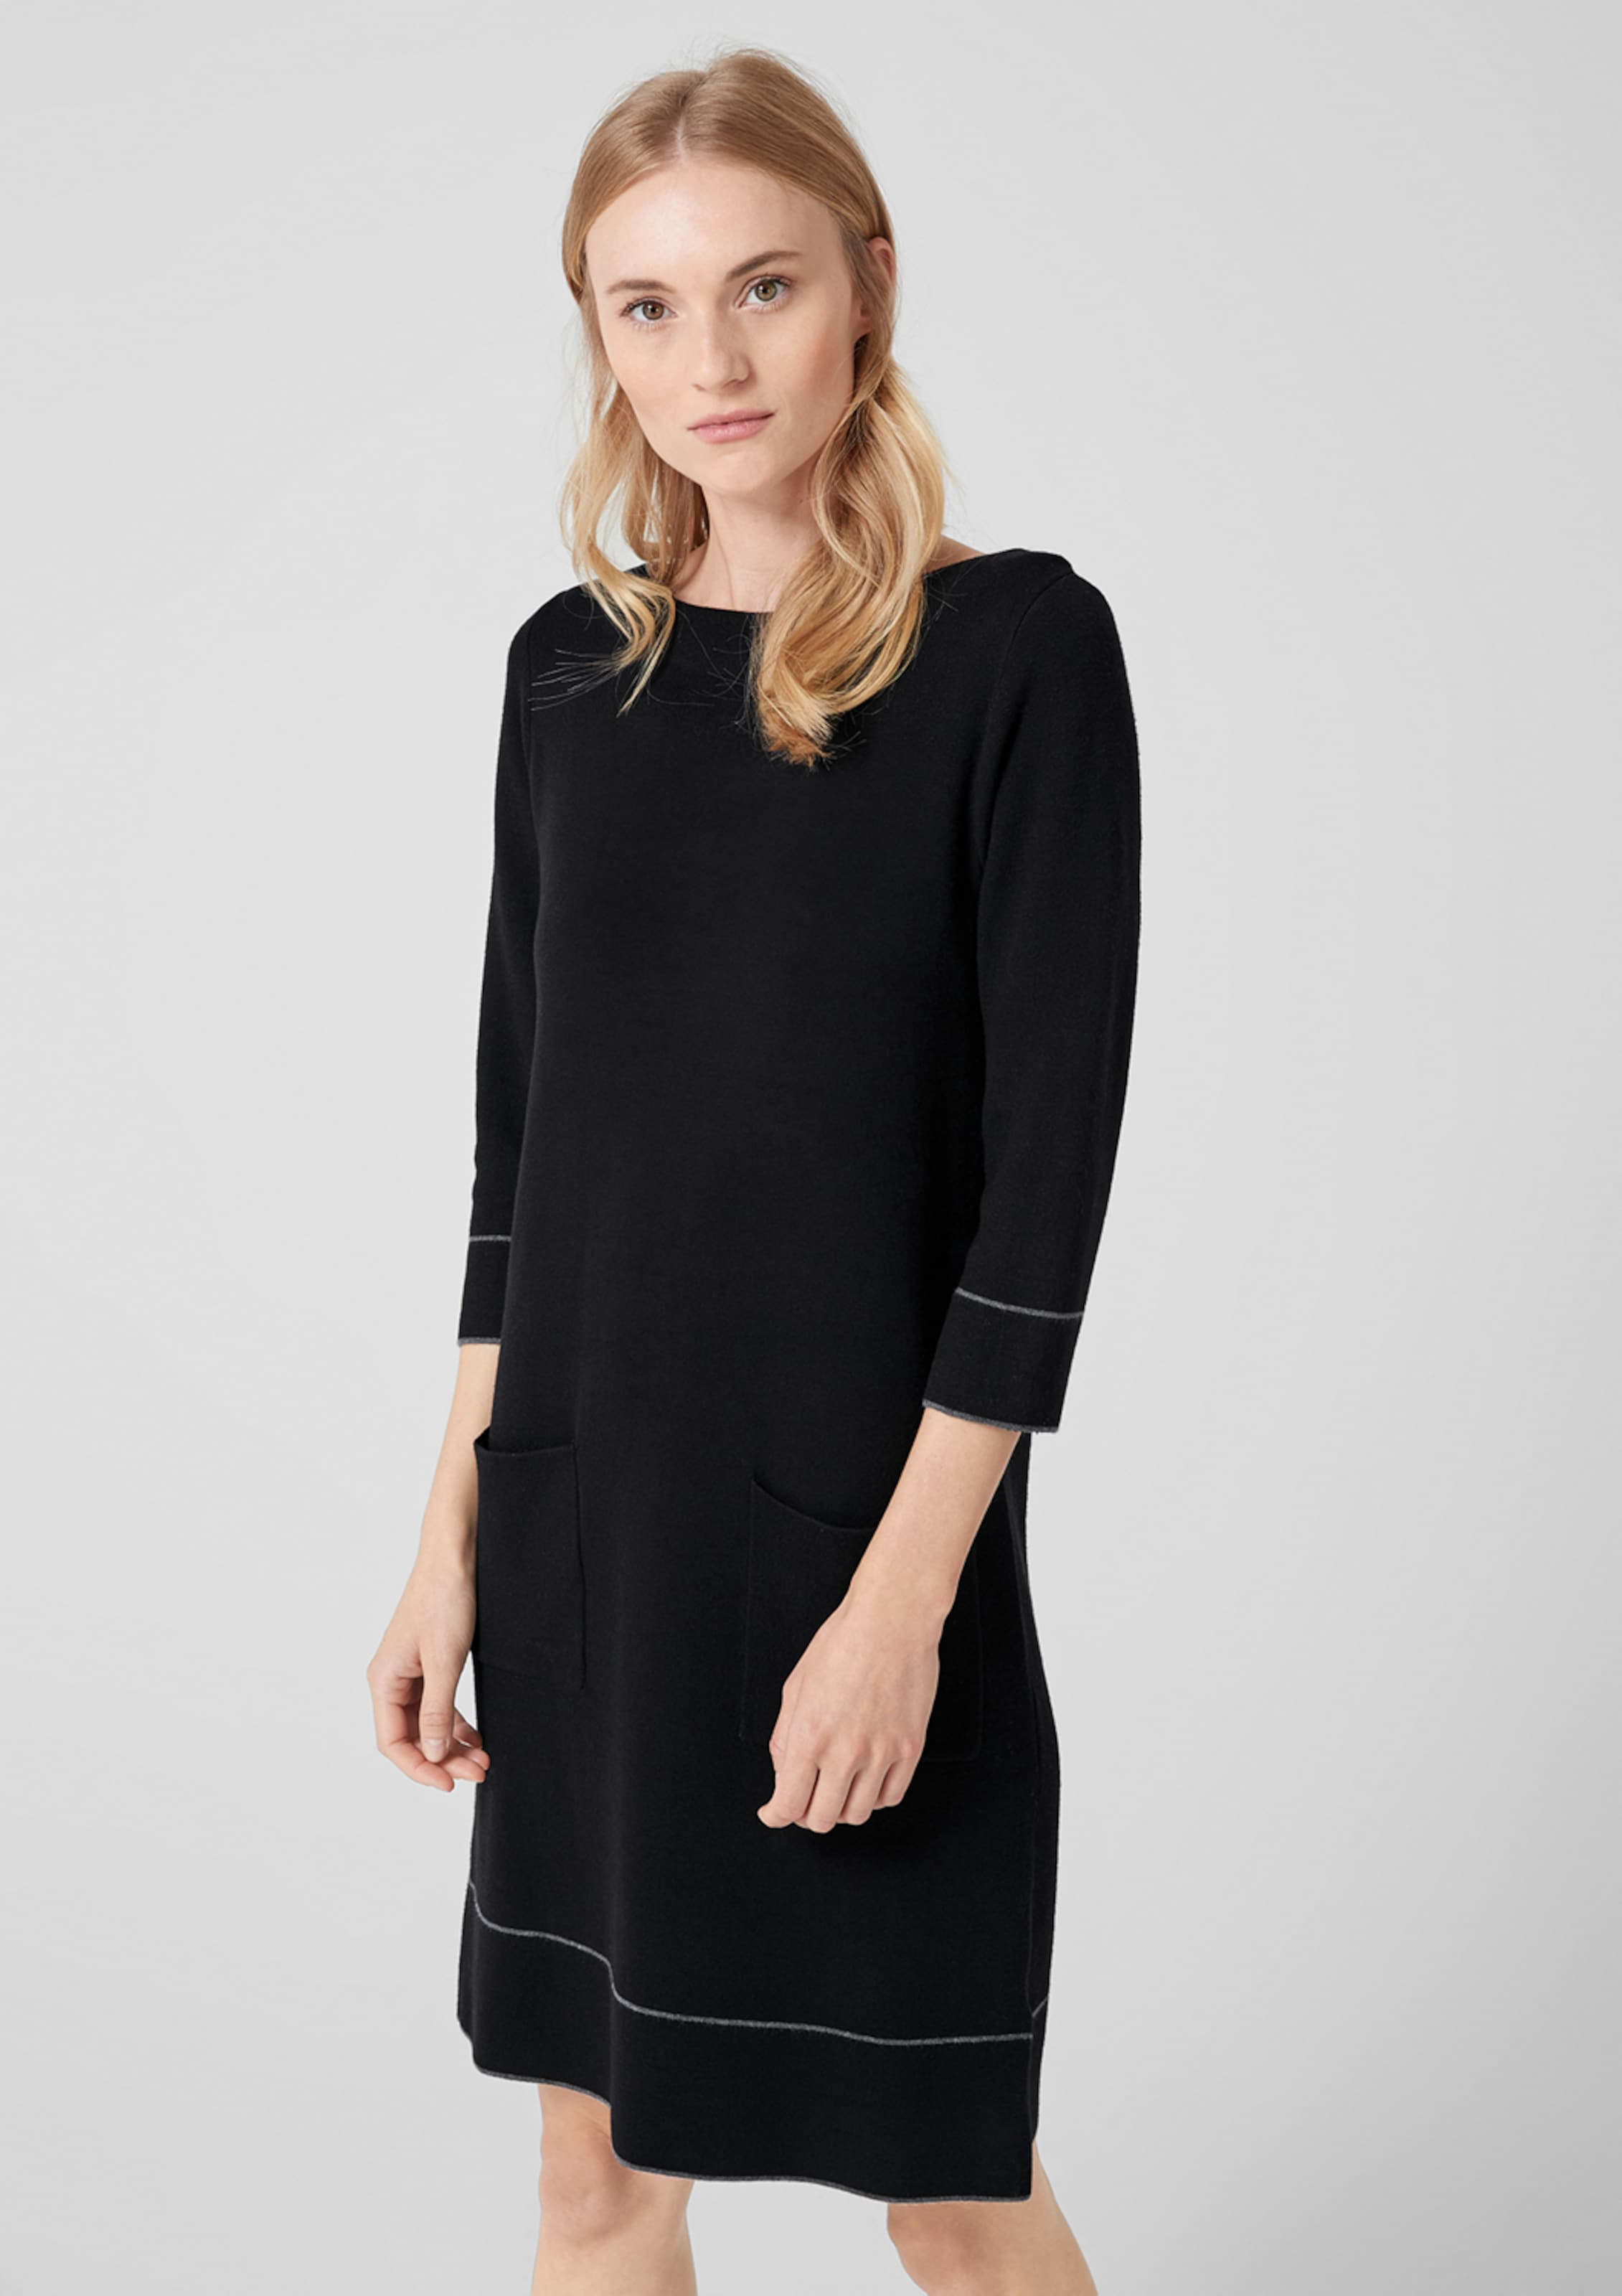 S oliver Kleid Schwarz Red Label In qUzLVpSMG